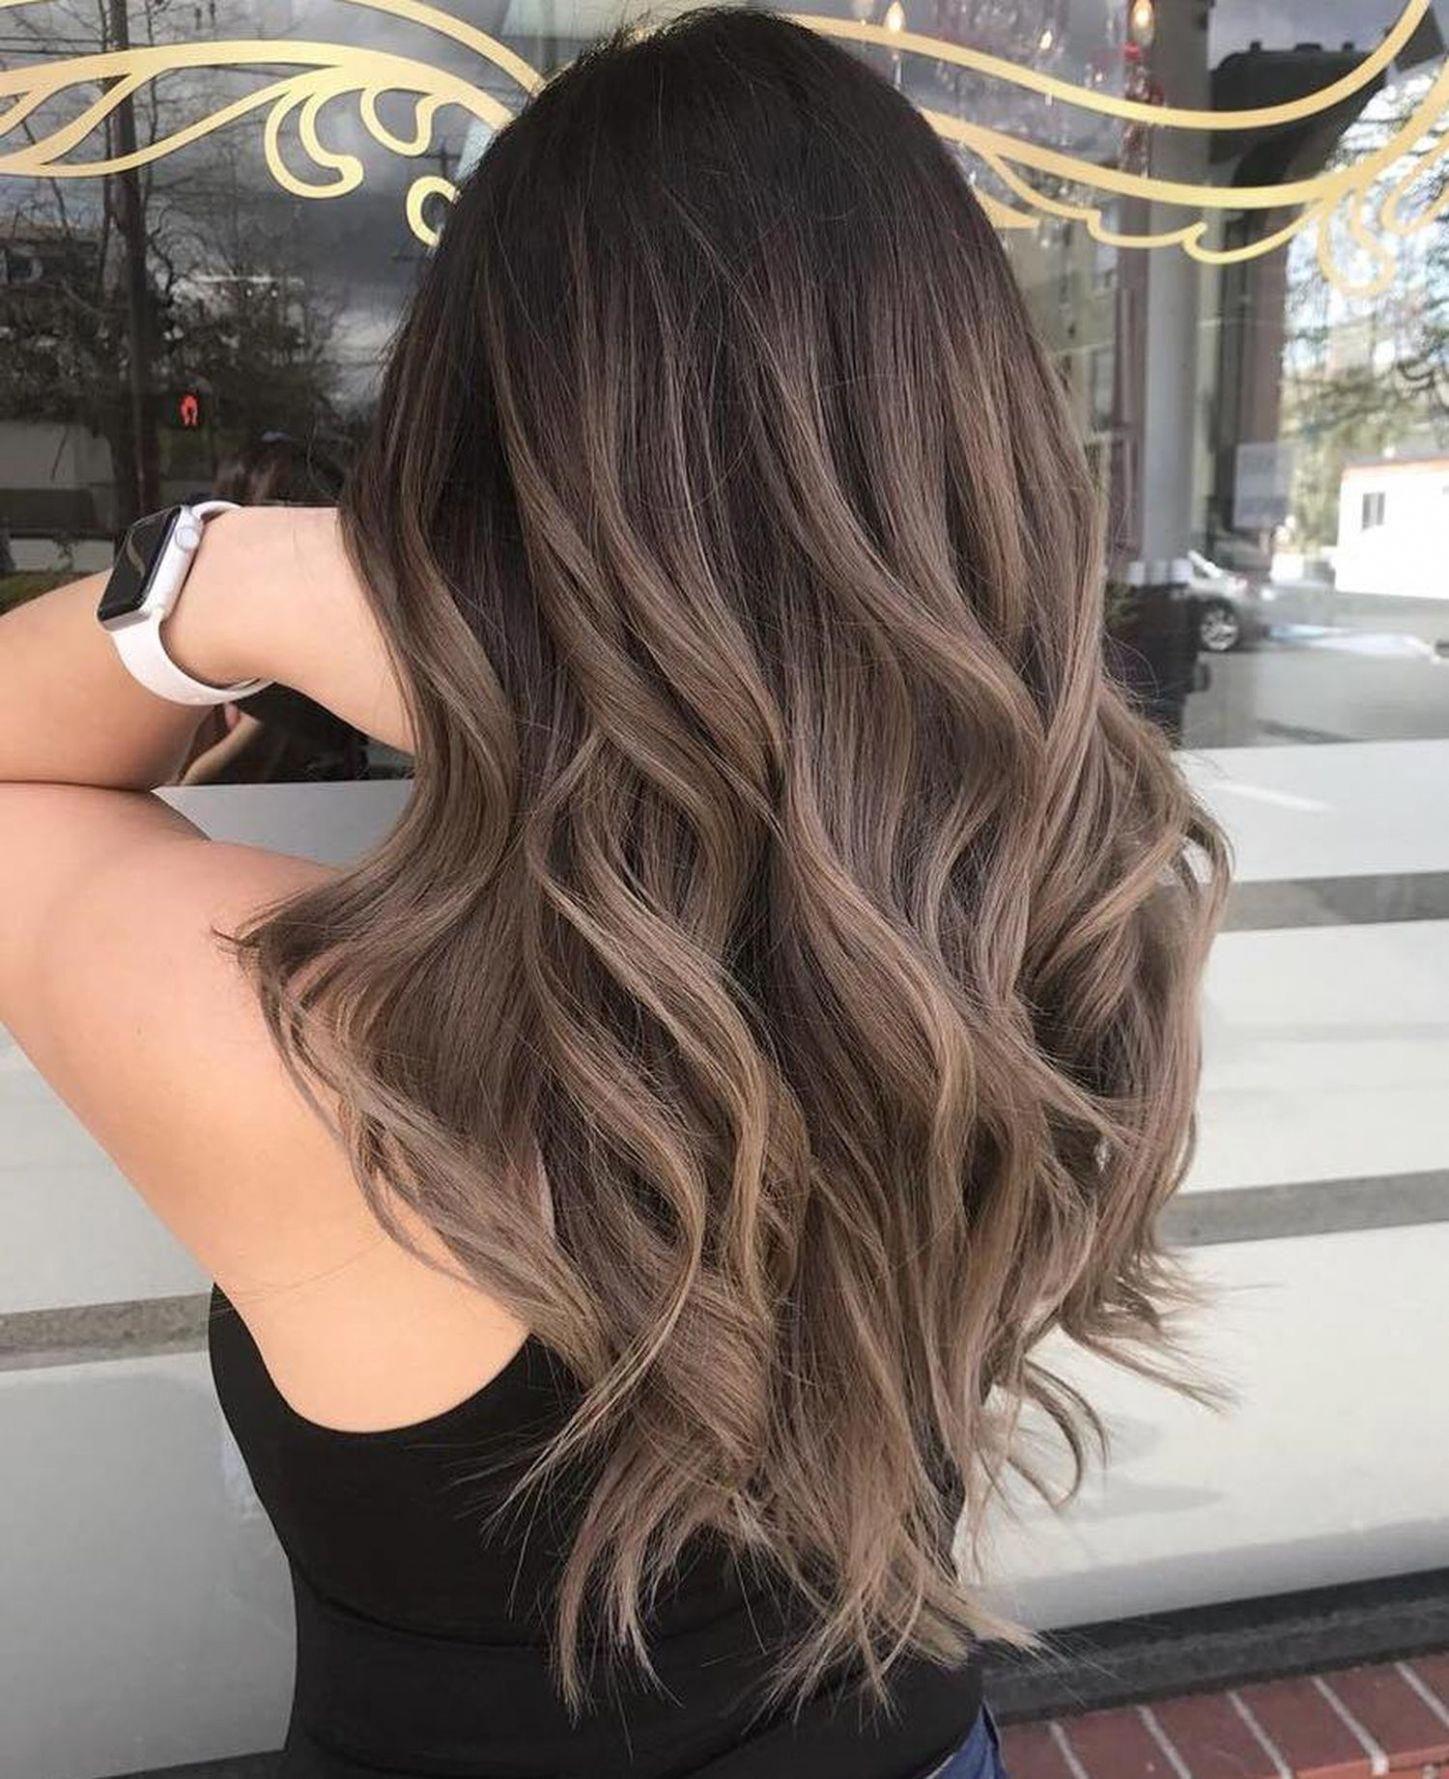 36+ Ash brown highlights on dark brown hair ideas in 2021